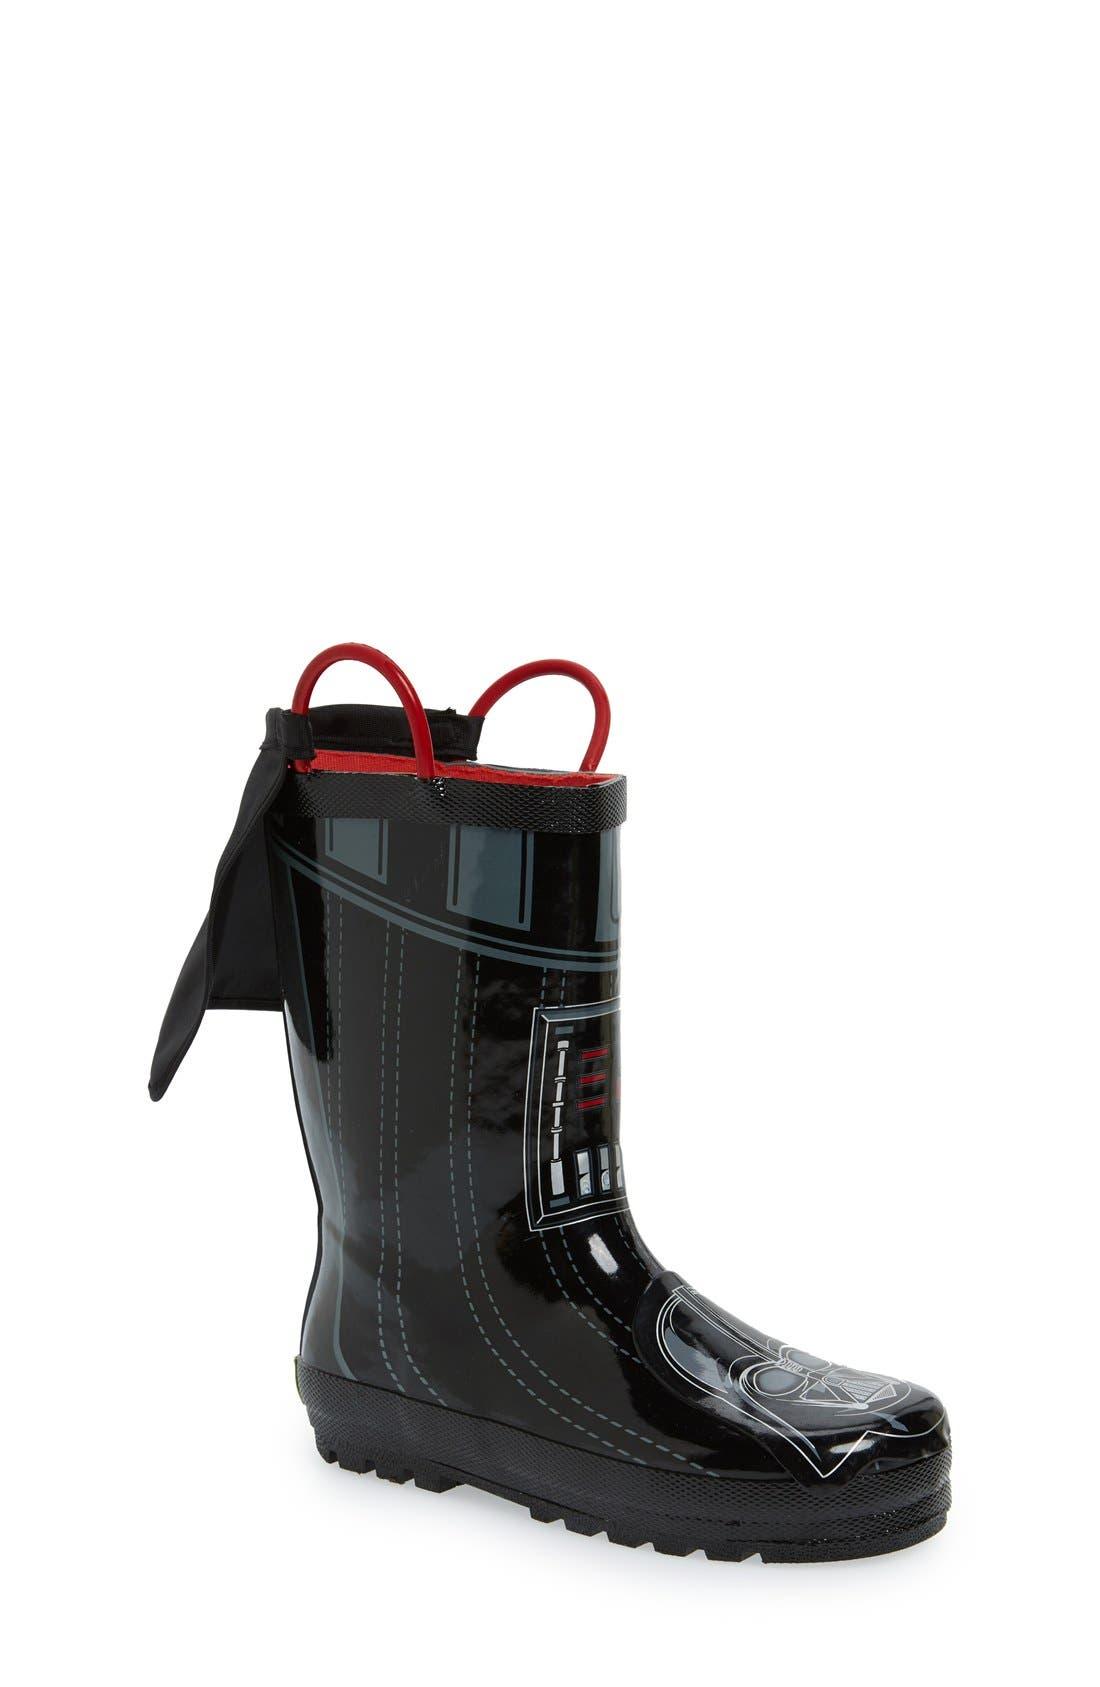 Star Wars<sup>™</sup> - Darth Vader Waterproof Rain Boot,                         Main,                         color, 001